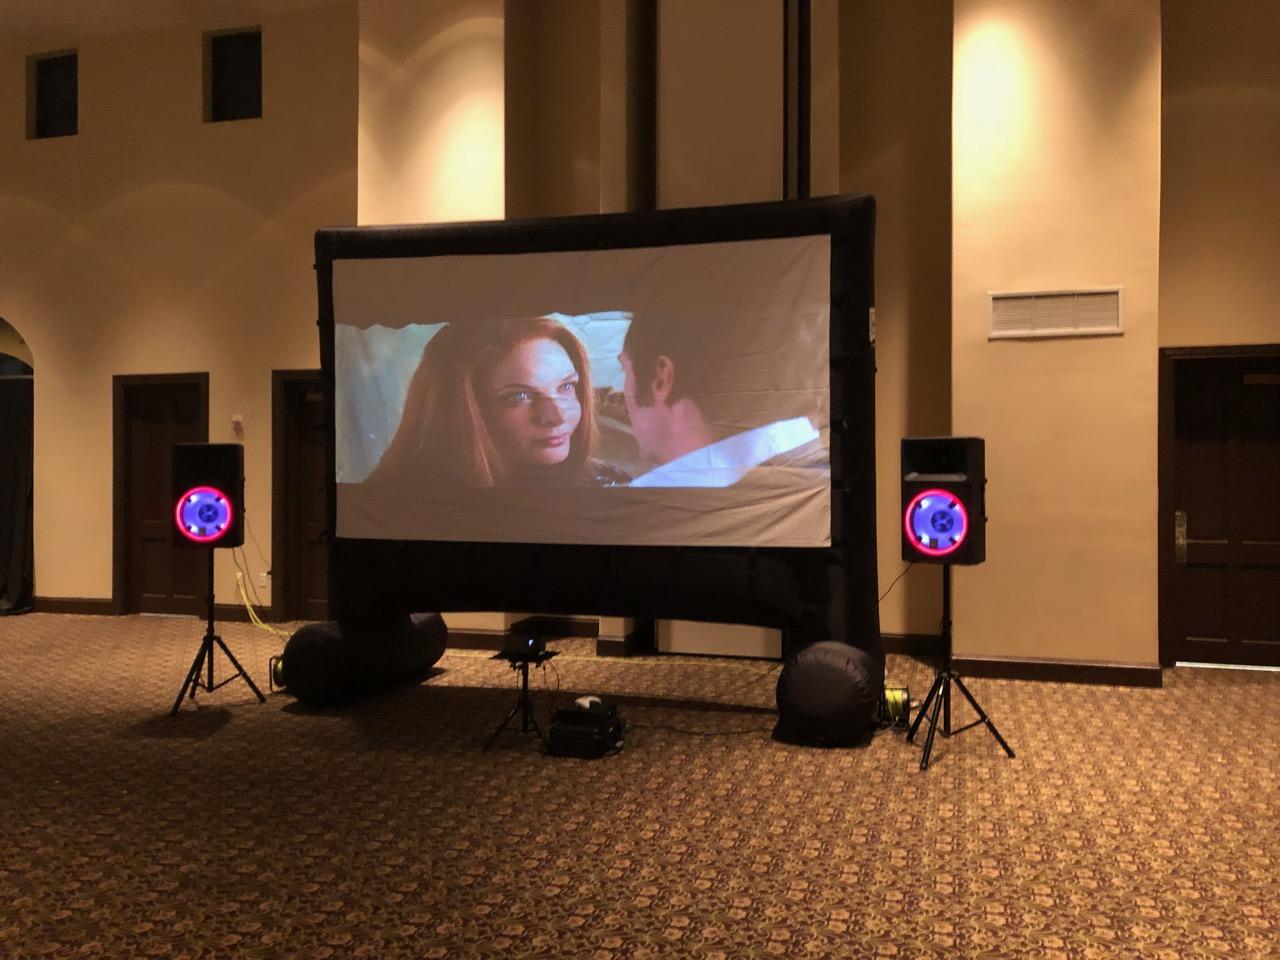 16 Foot Projector Rental Florida - Birth